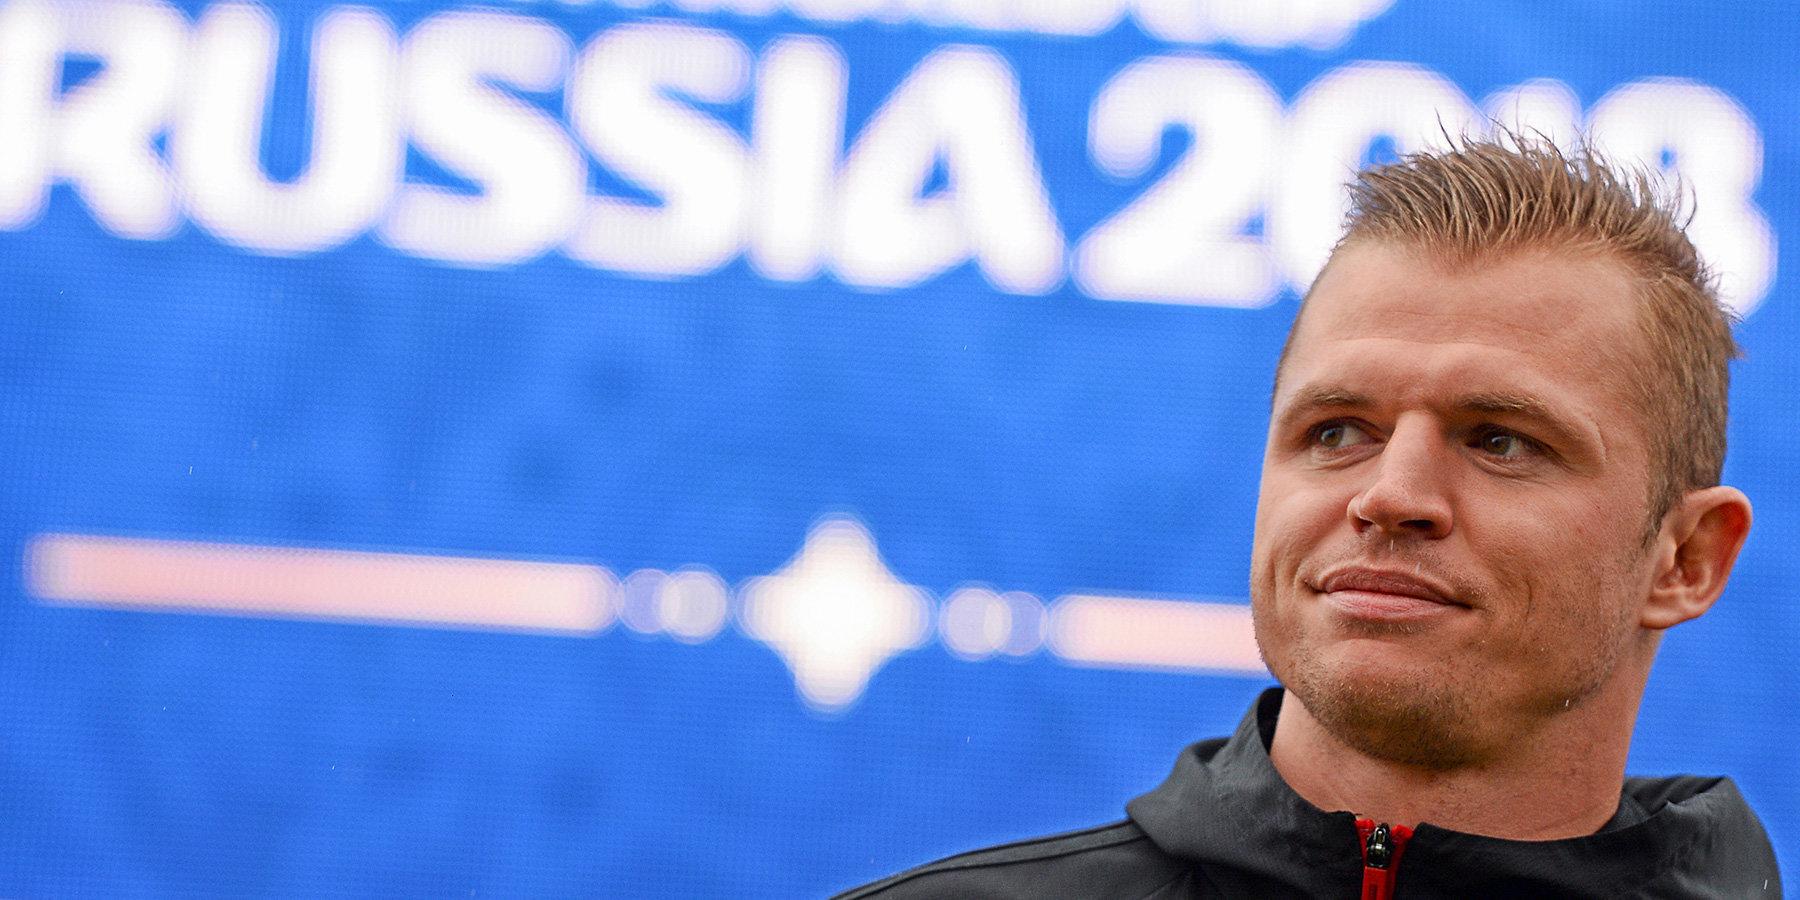 Дмитрий Тарасов погасил многомиллионный долг по алиментам